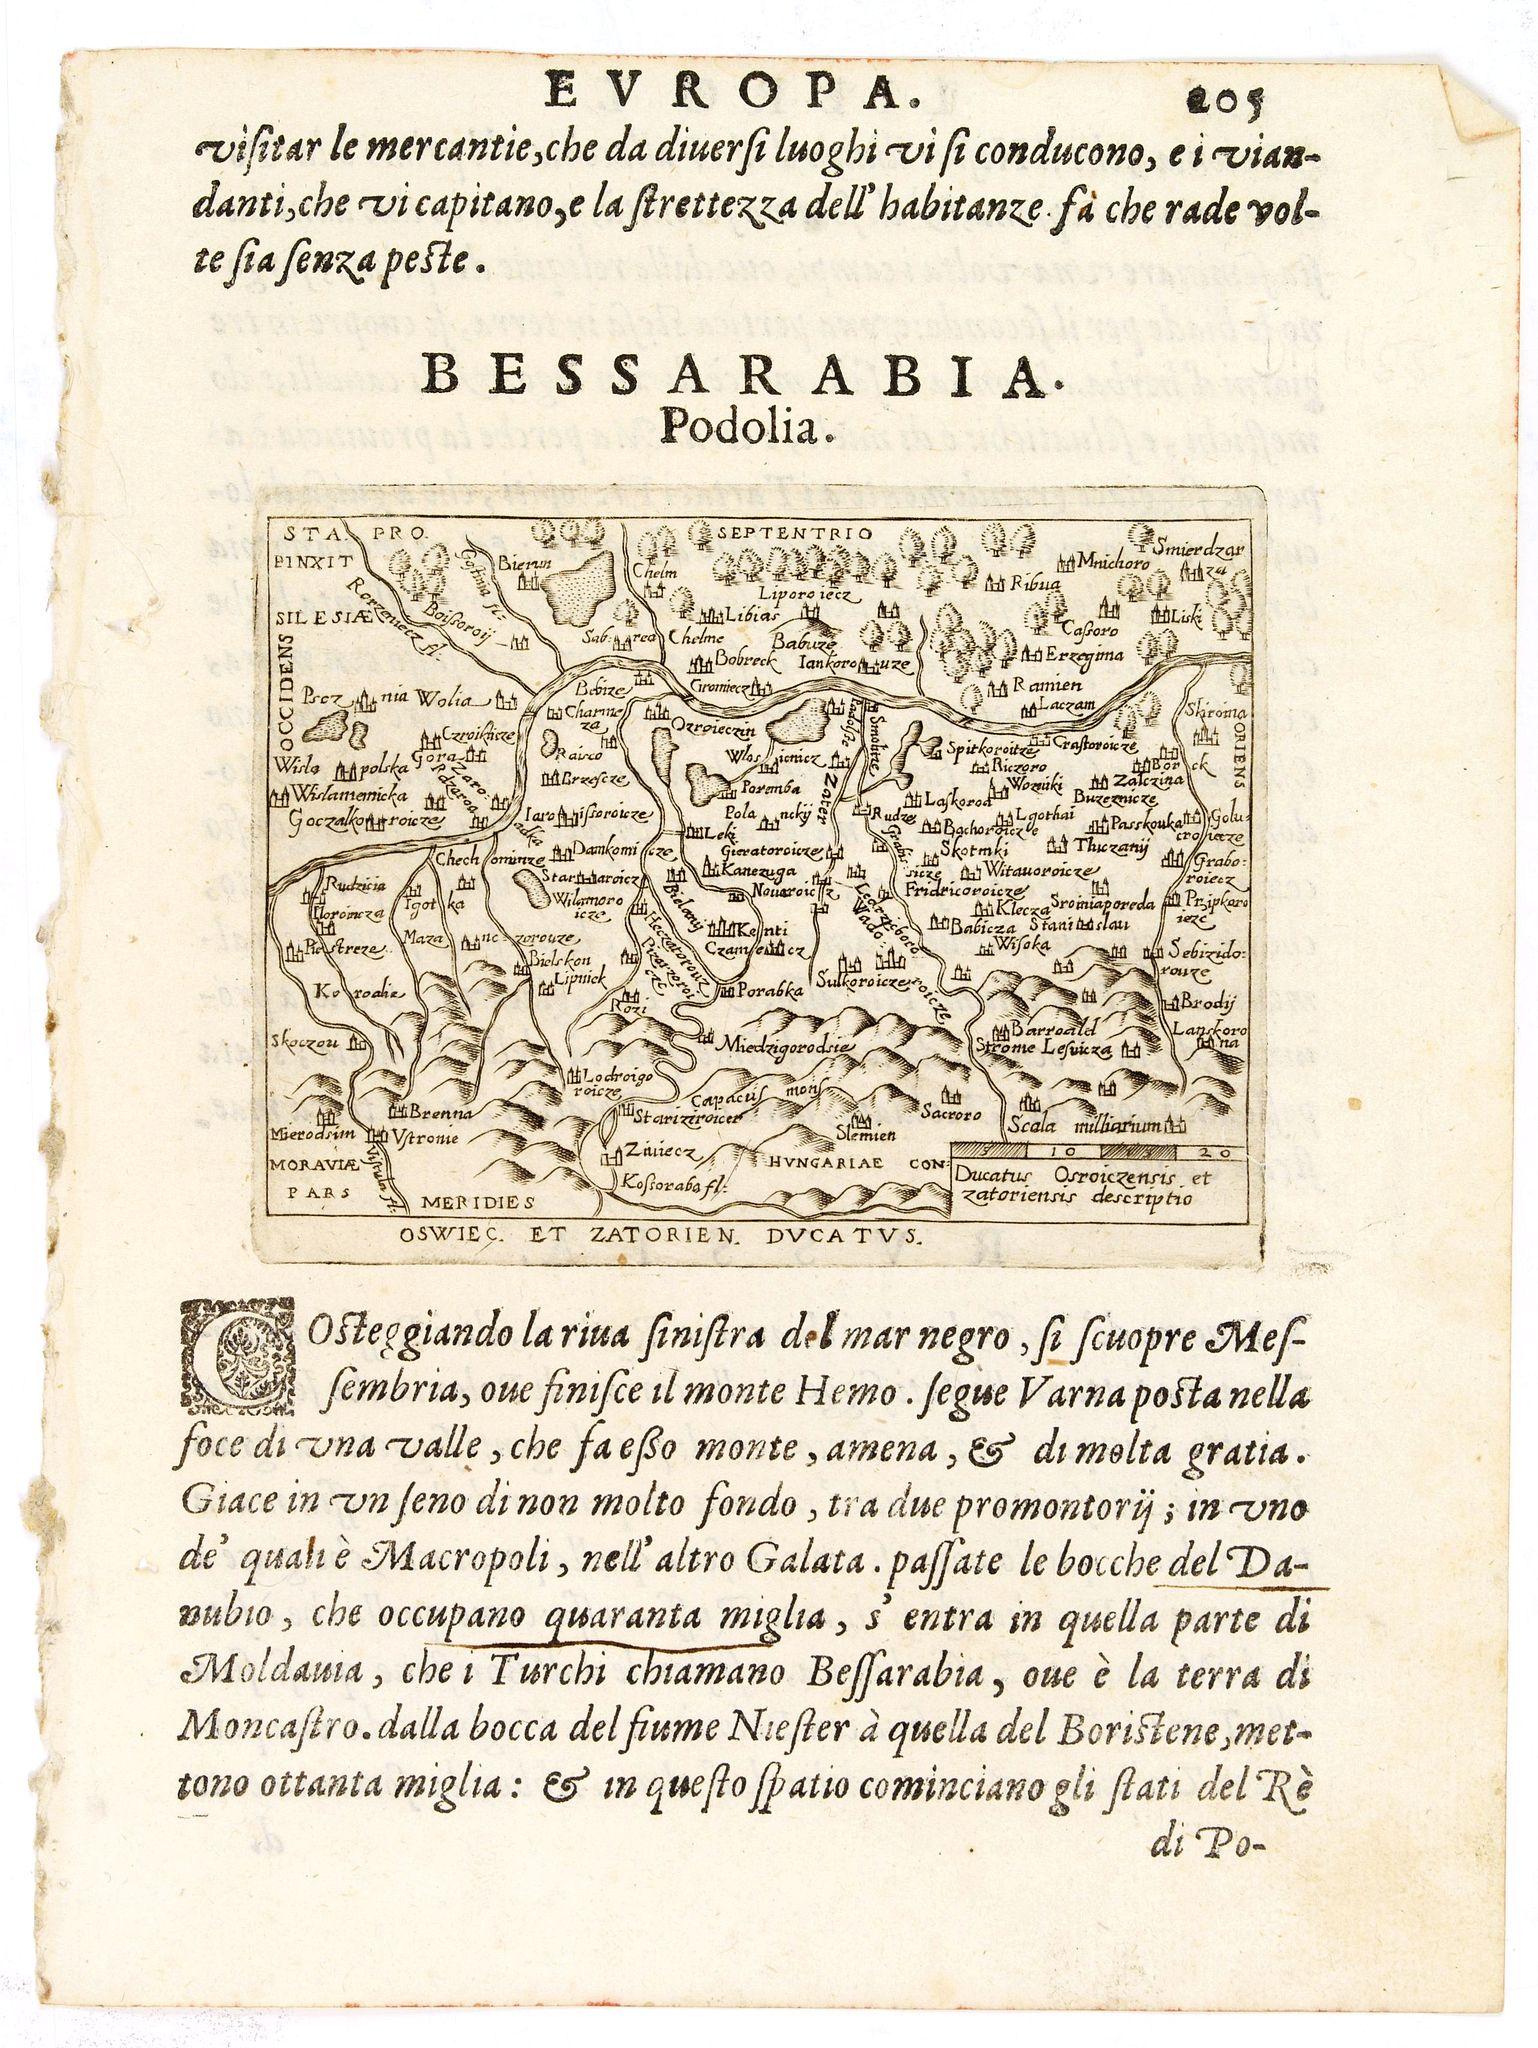 ORTELIUS, A. / MACHETTI, P. -  Oswiec. et Zatorien. Ducatus.